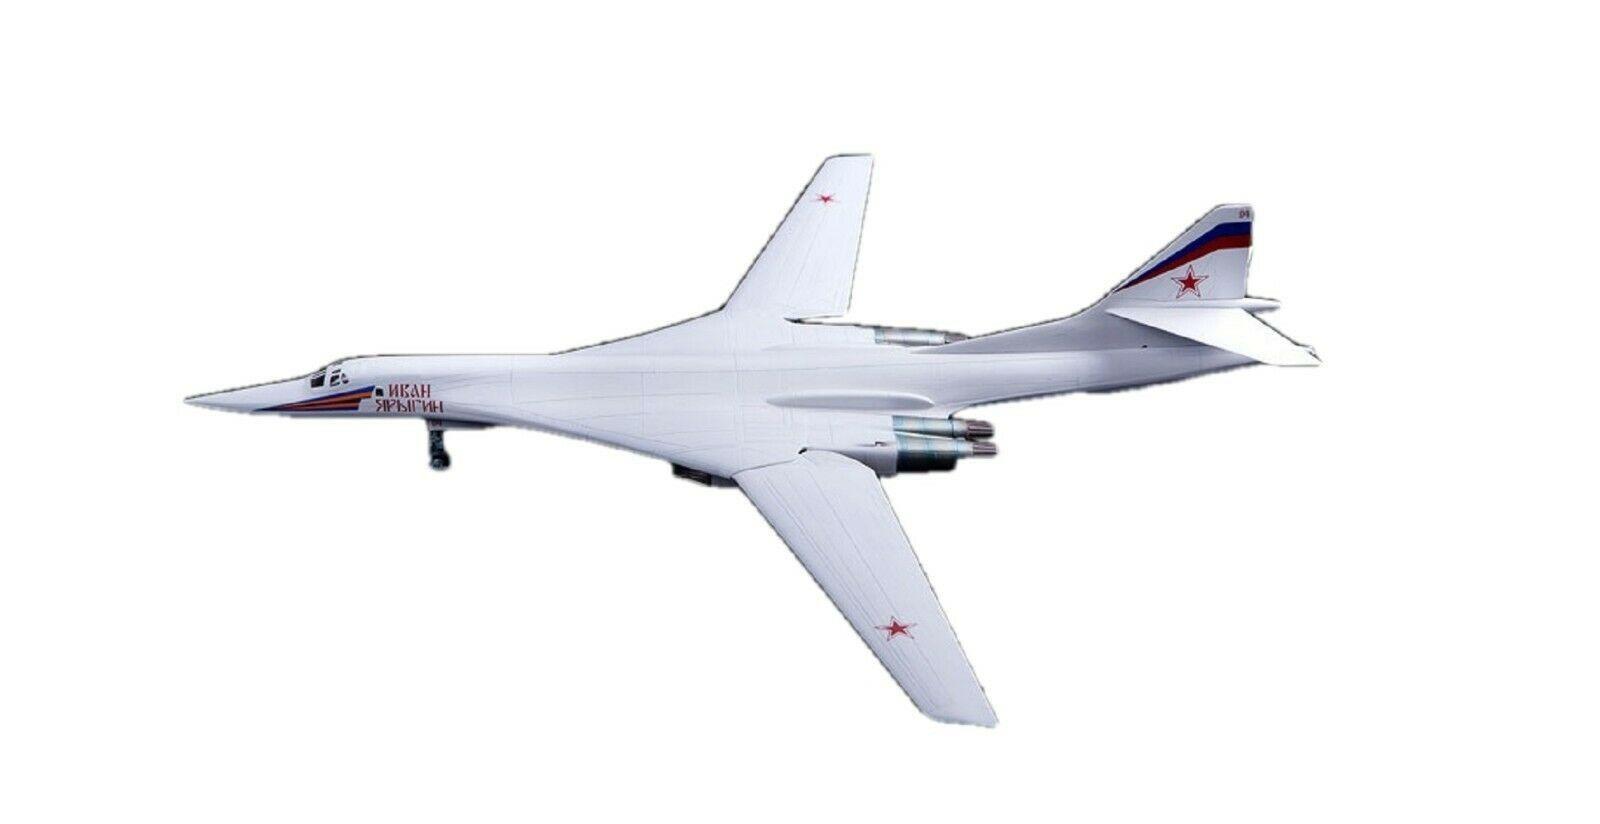 Academy 12621 Russian Air Force Tu-160 Blackjack Plamodel Plastic Hobby Model